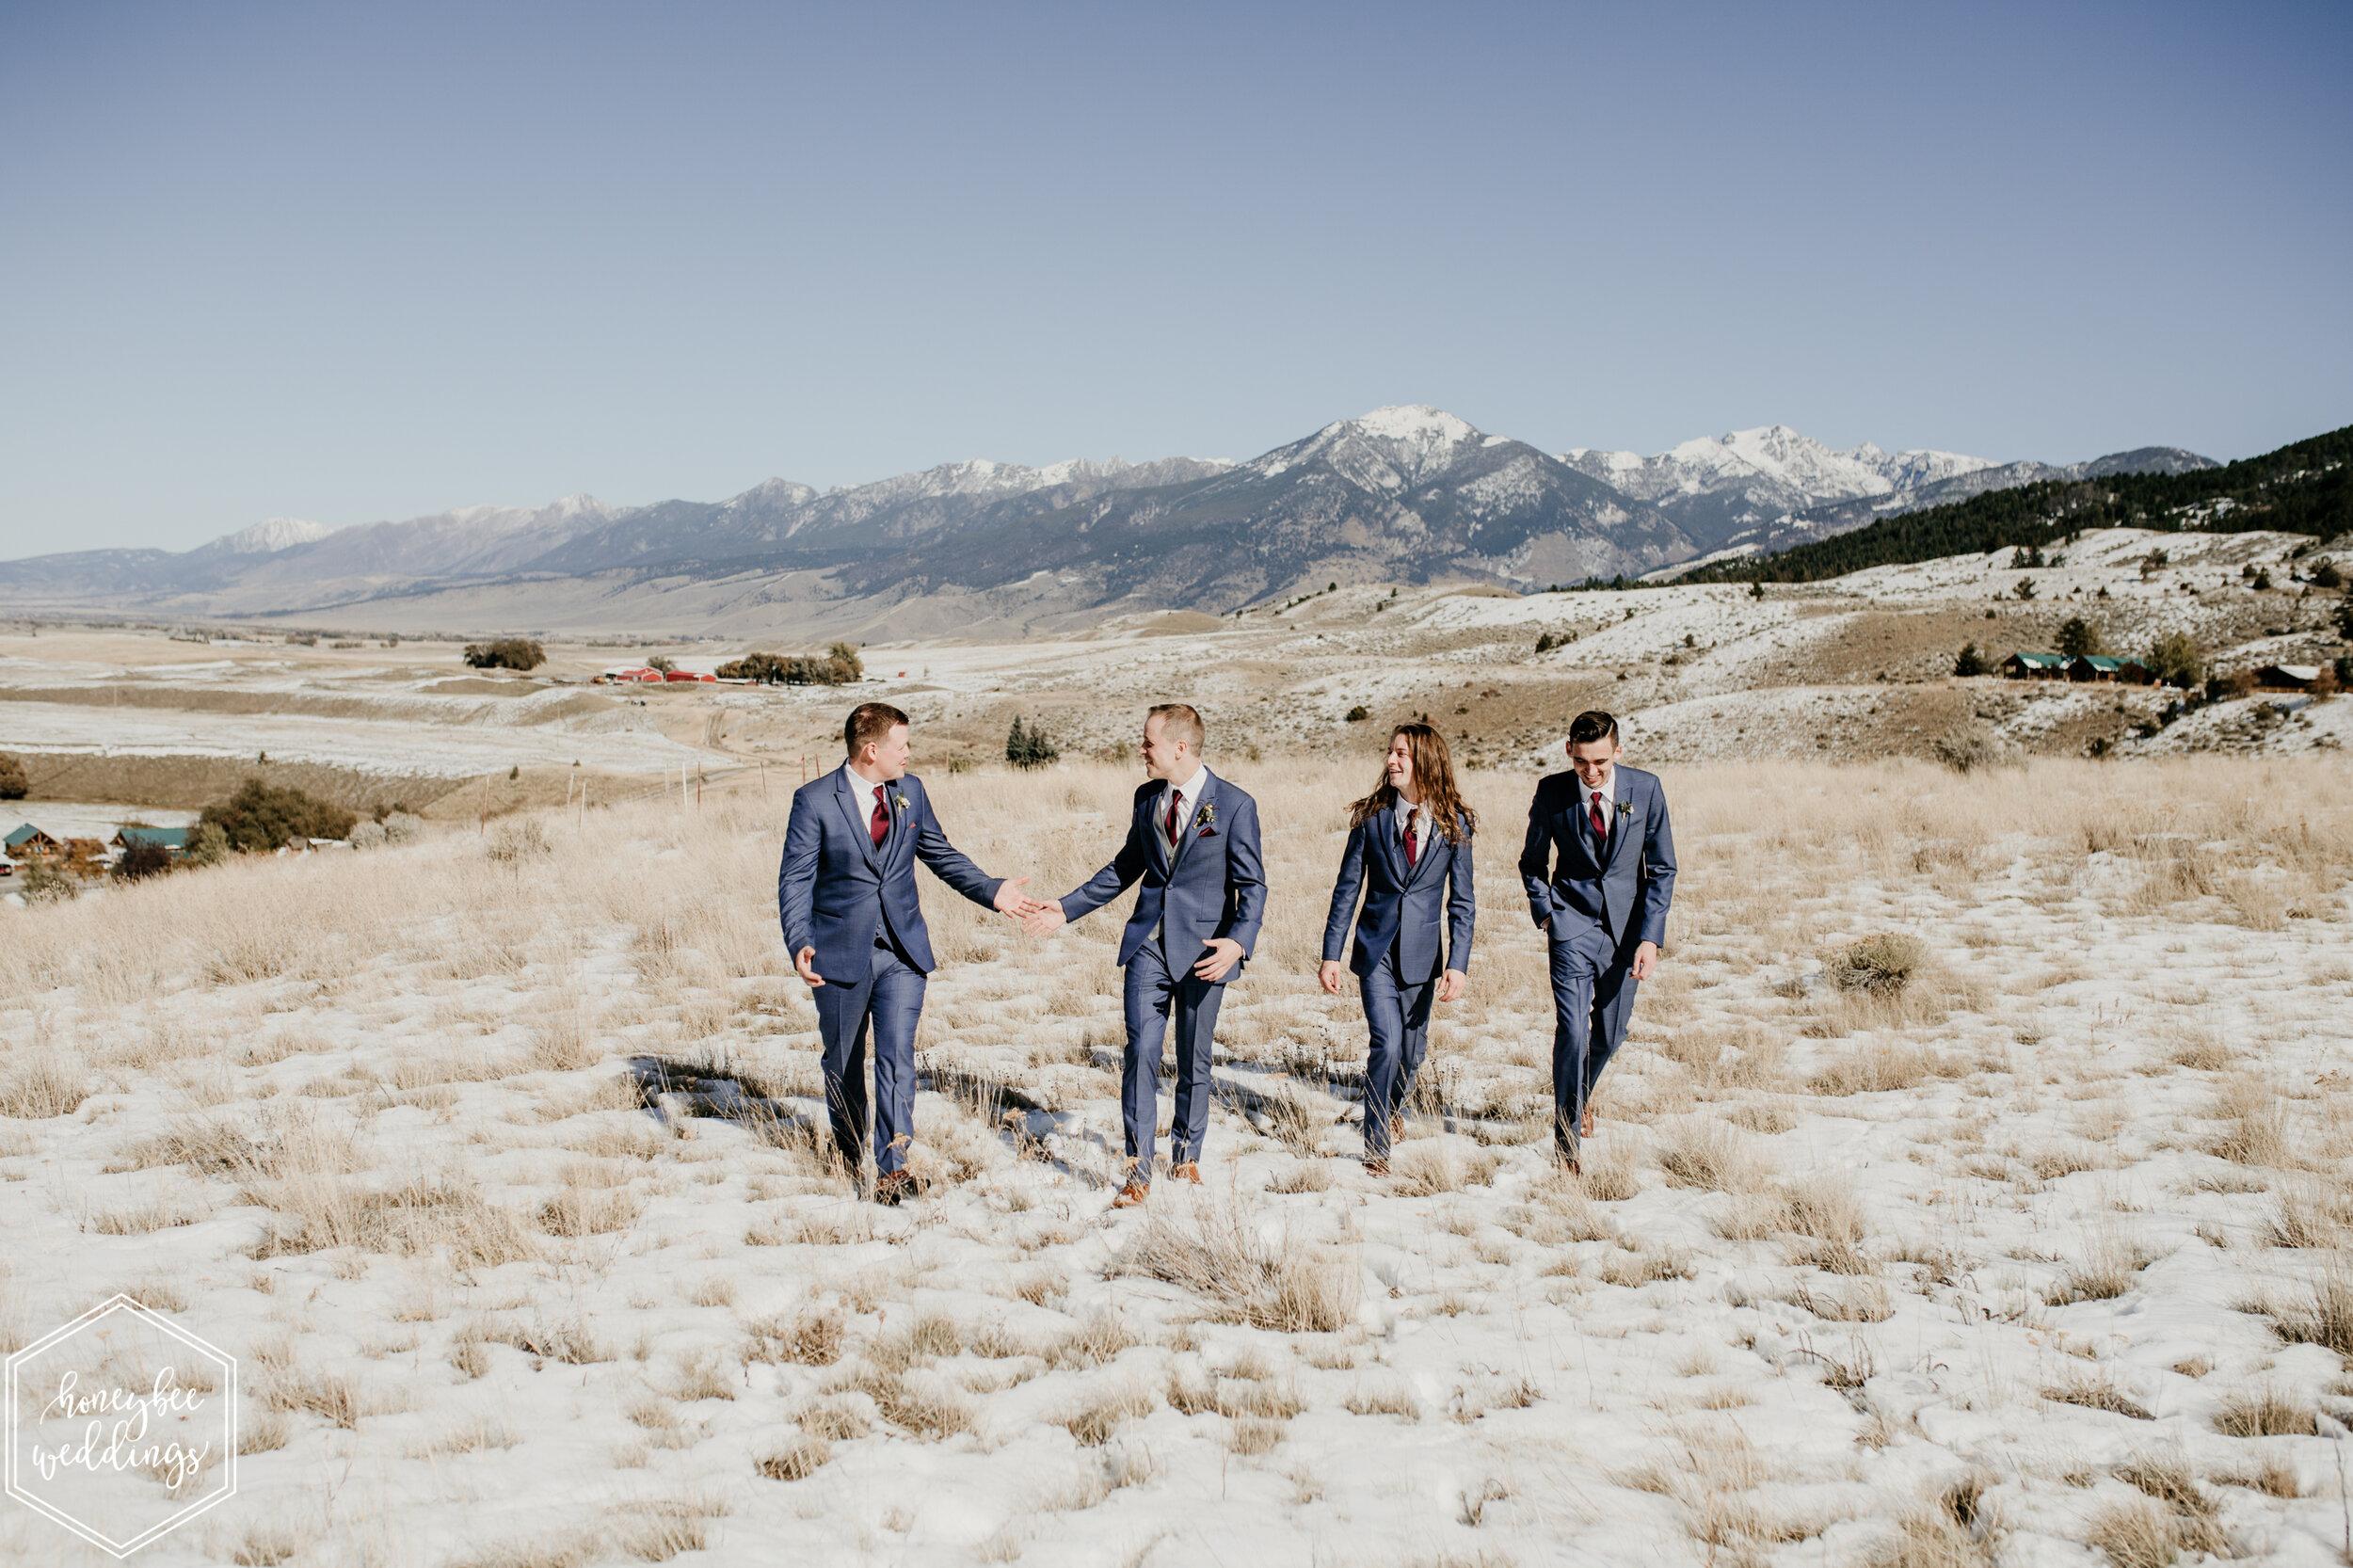 103Chico Hot Springs Wedding_Montana Wedding Photographer_Winter Wedding_Ariel & Richard_October 12, 2019-1303.jpg